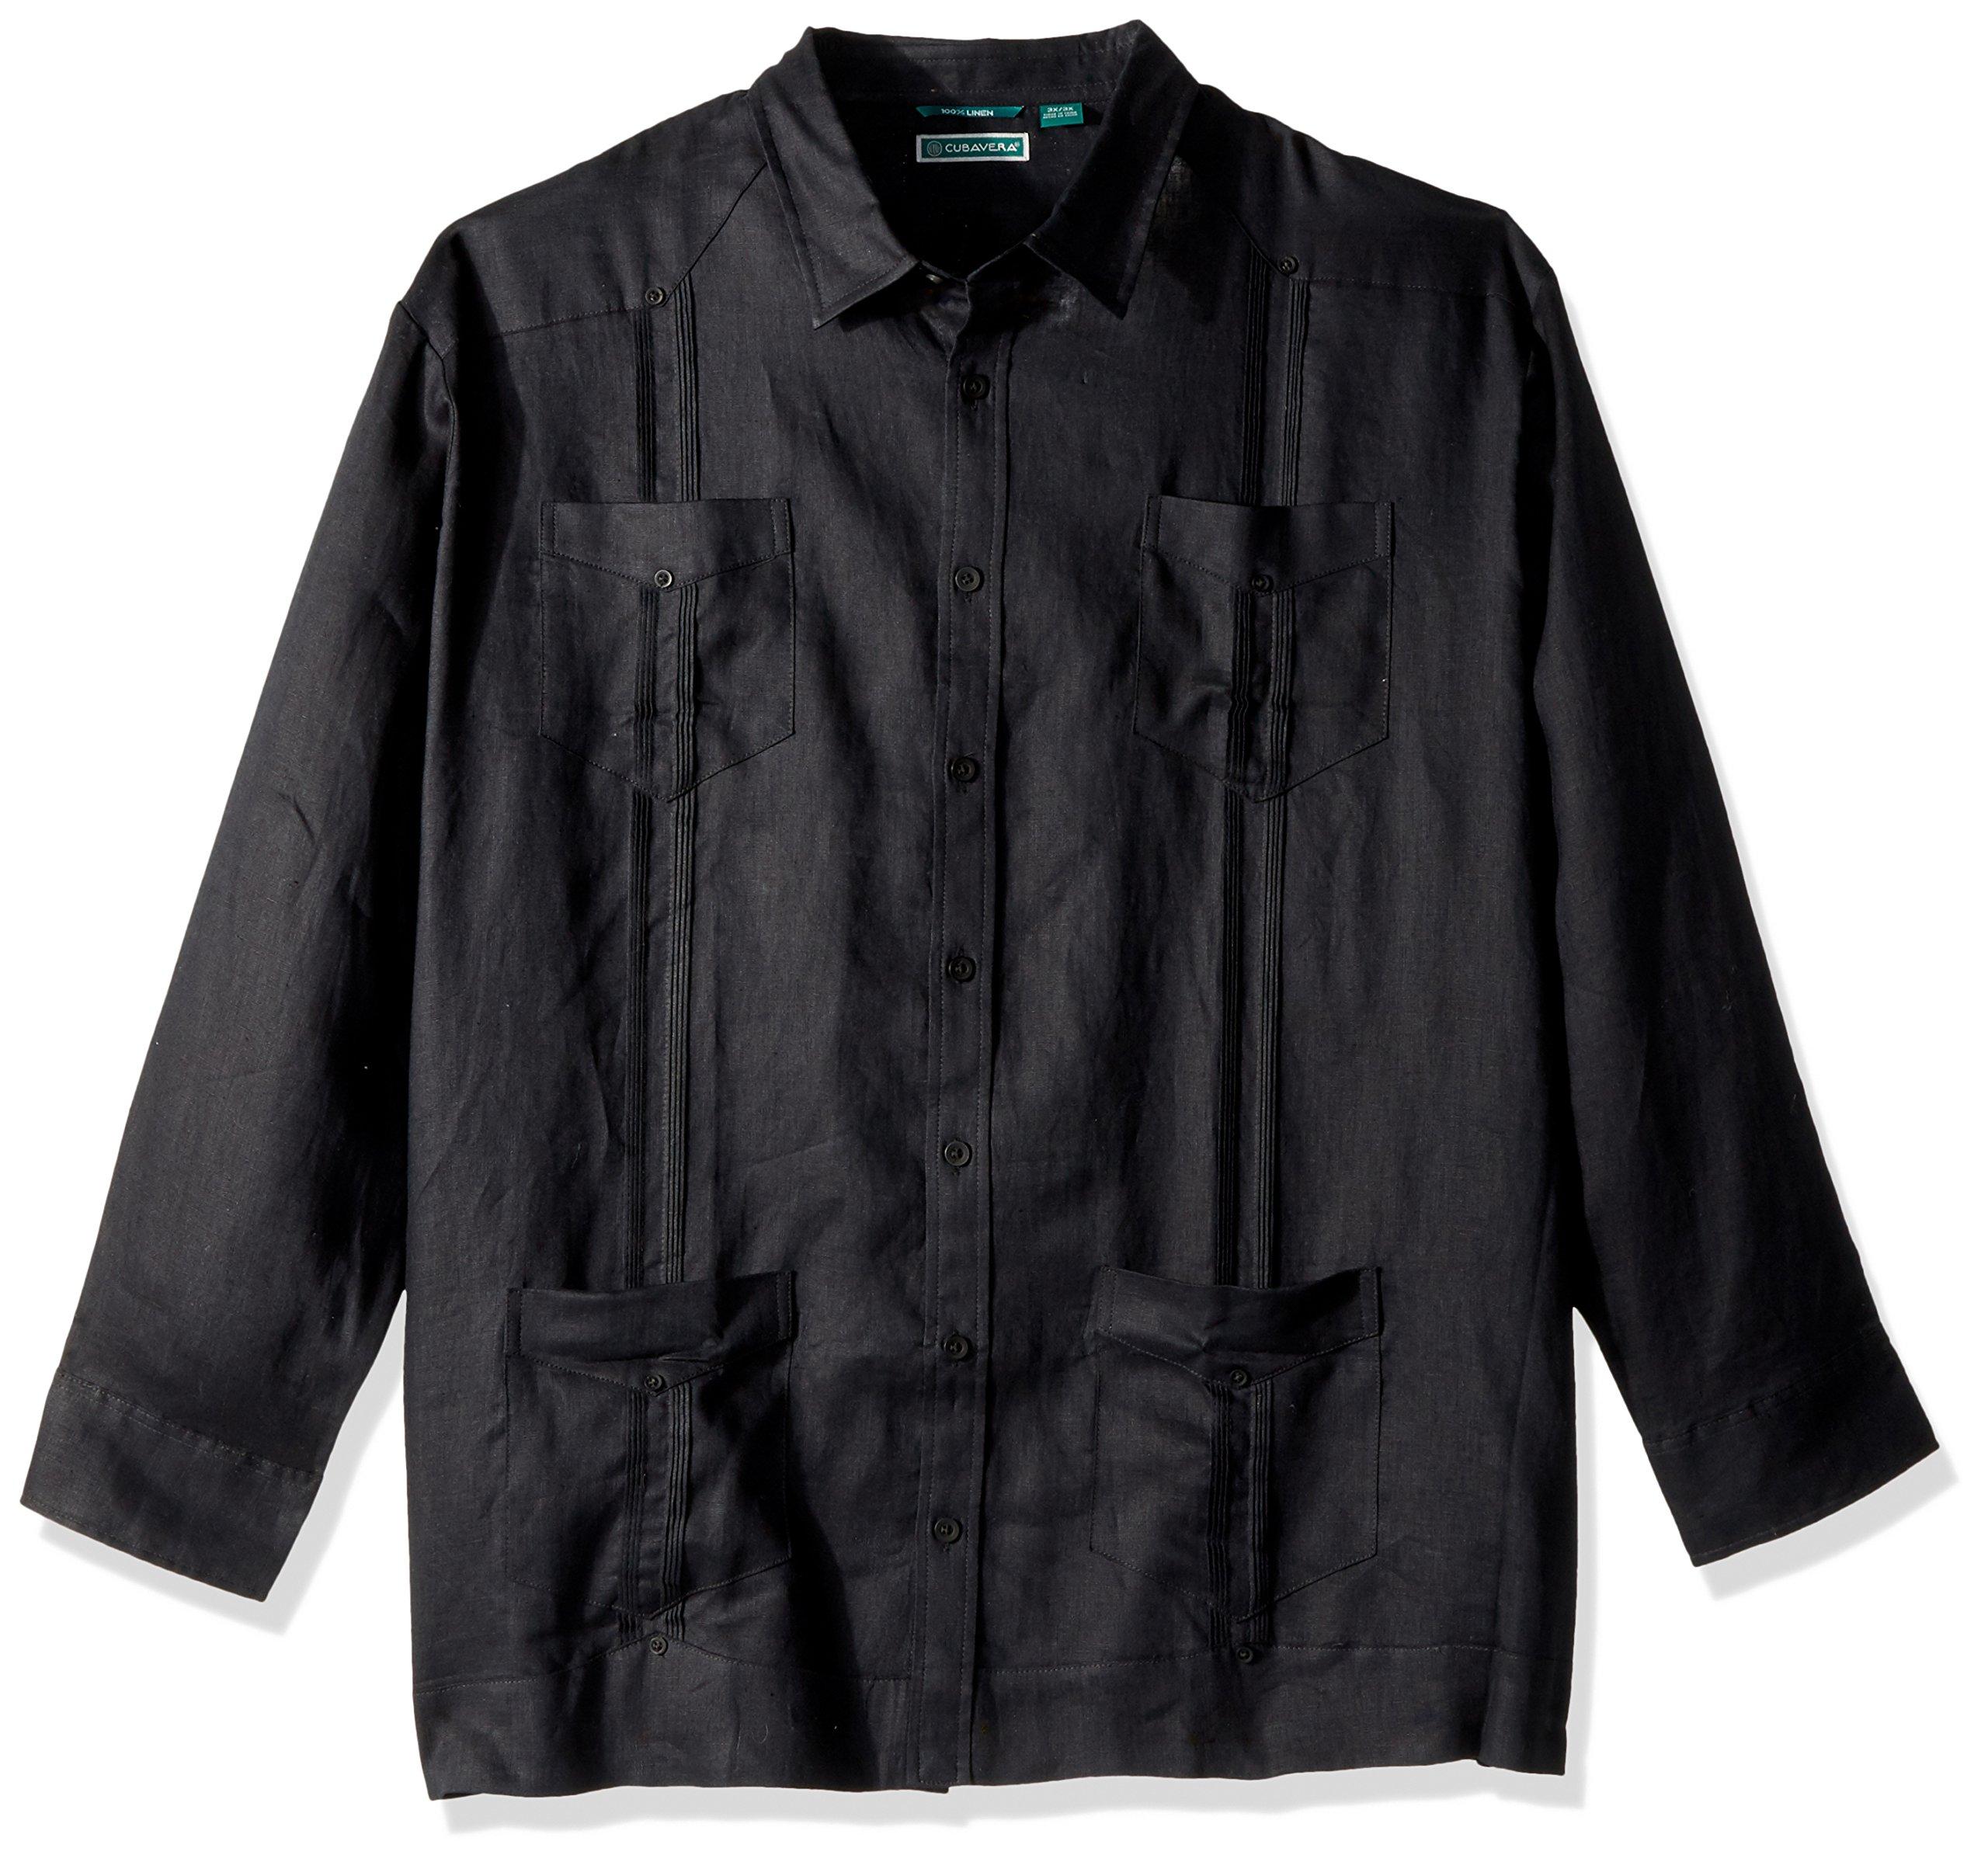 Cubavera Men's Big Long Sleeve 100% Linen Cuban Guayabera Shirt, Jet Black, 4X-Large Tall